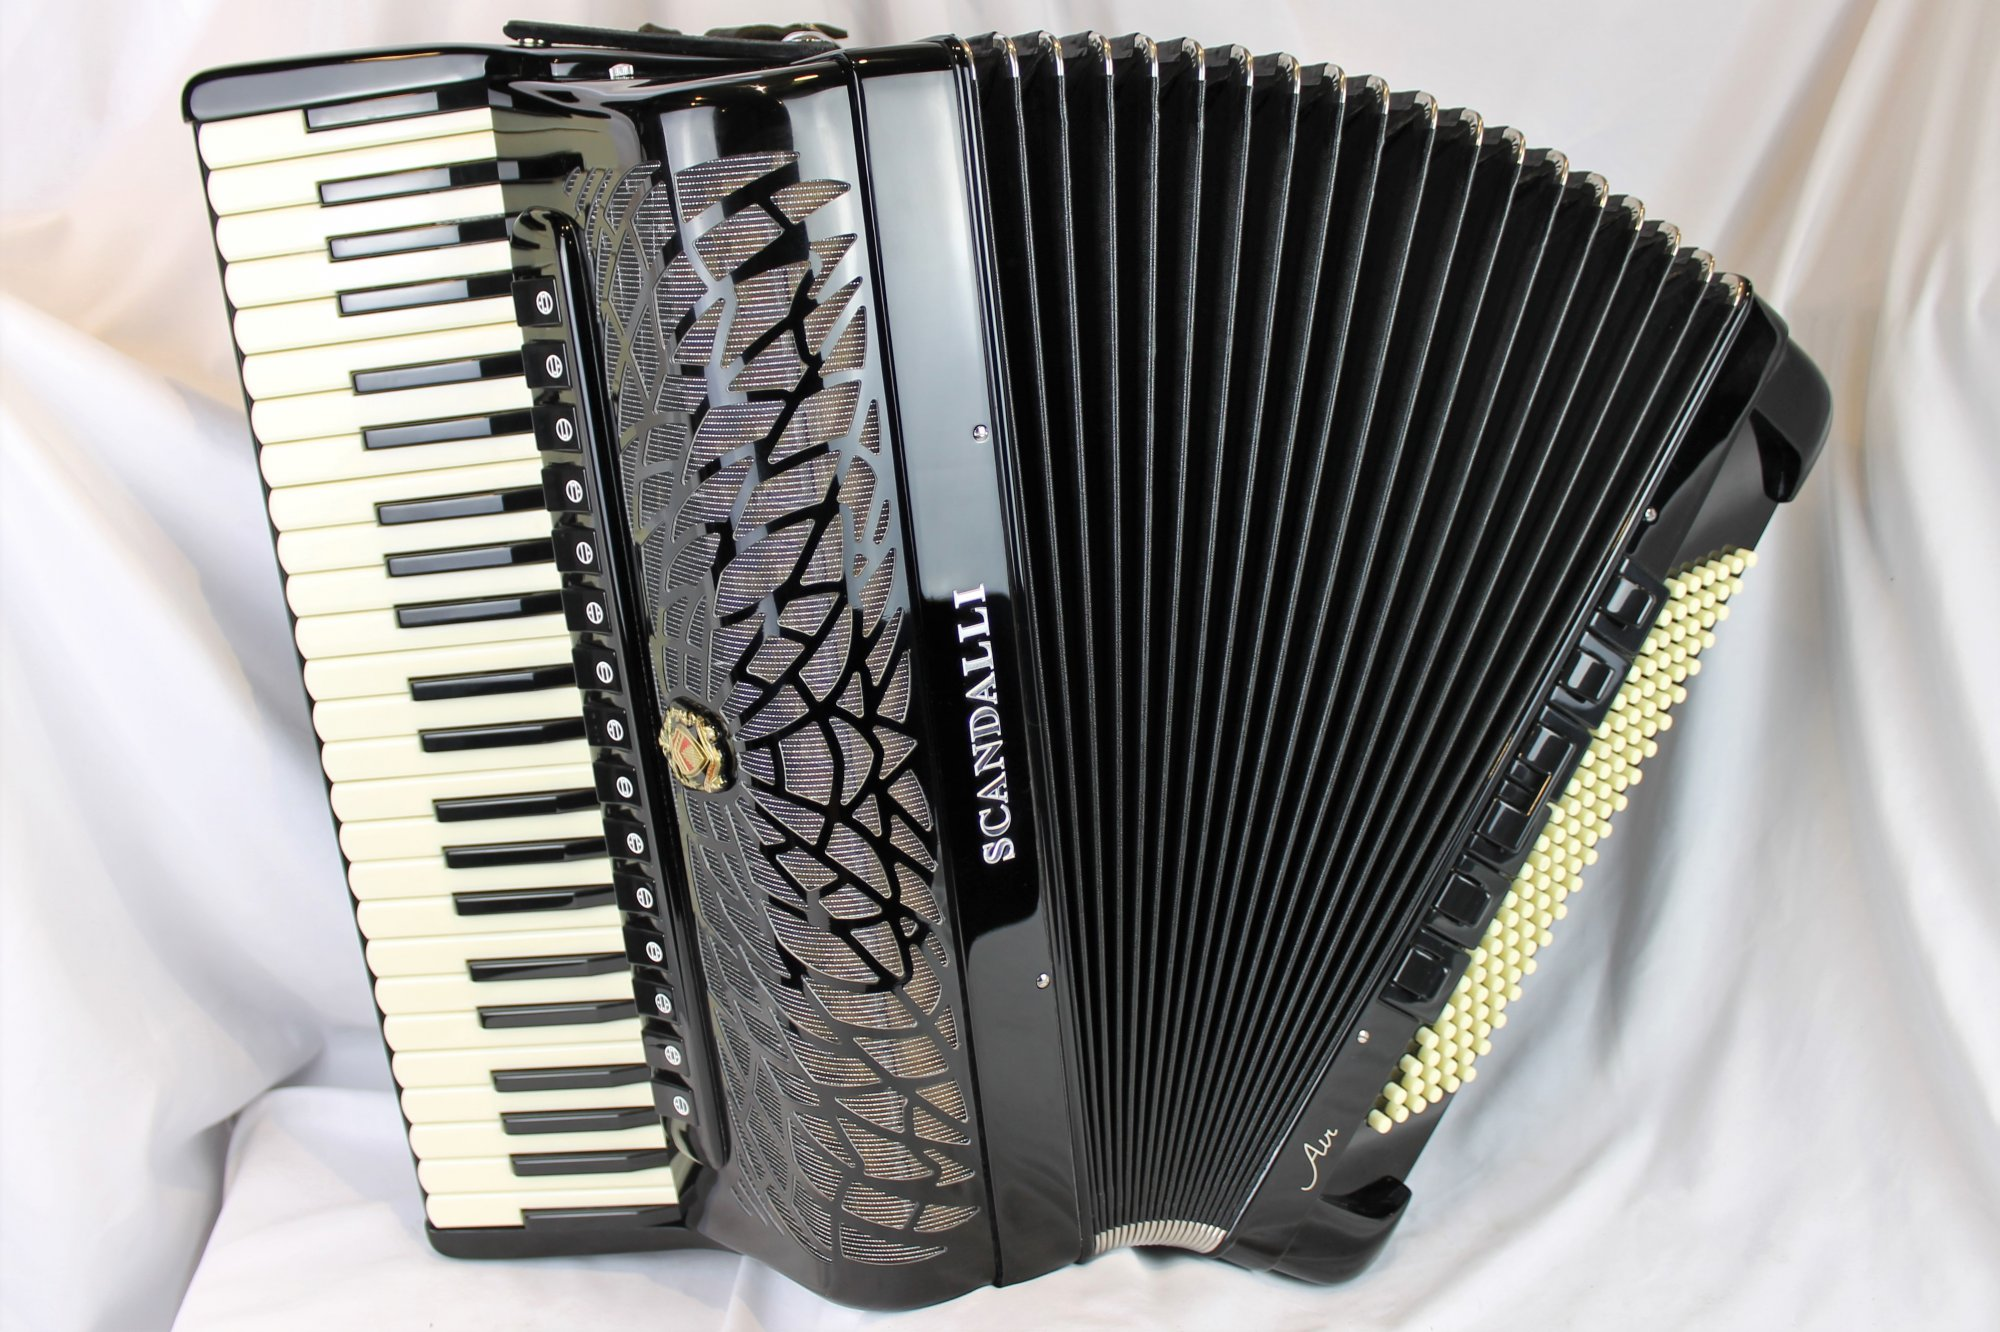 NEW Black Scandalli Air VI 47 Piano Accordion LMMH 47 120